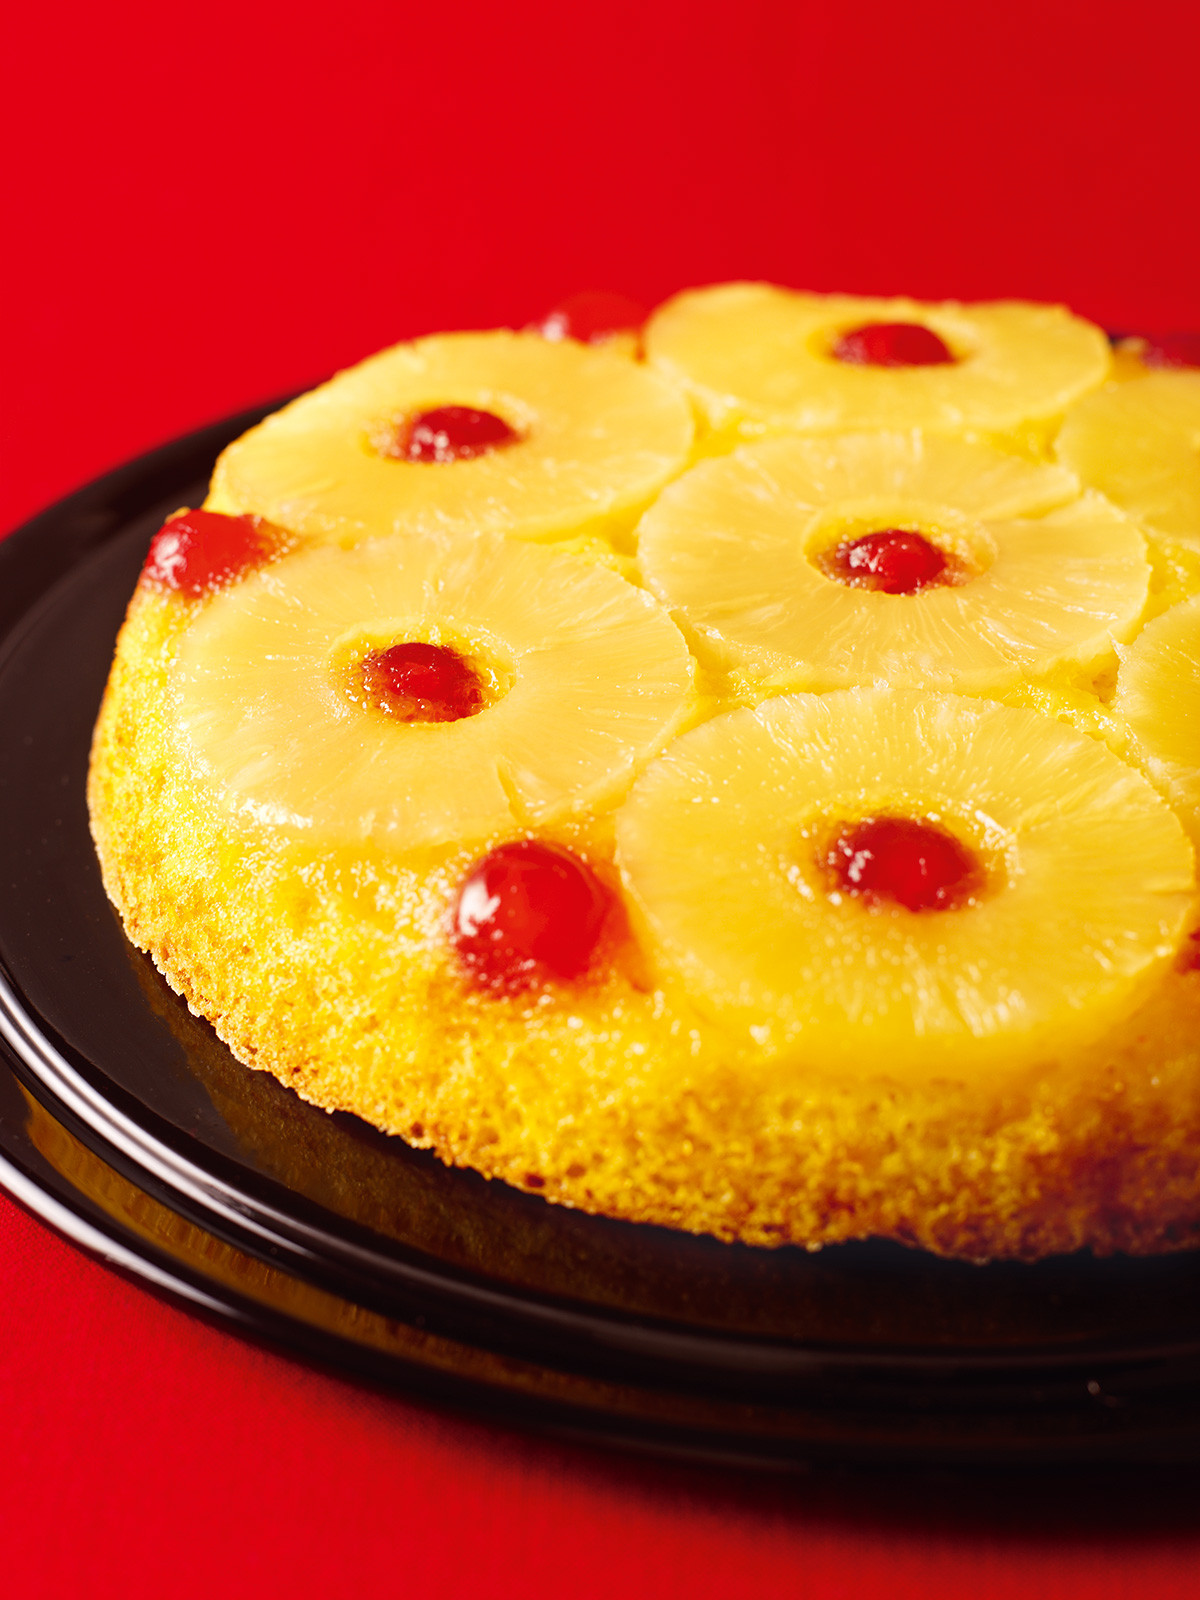 Homemade Pineapple Upside Down Cake  Pineapple Upside Down Cake Nigella s Recipes